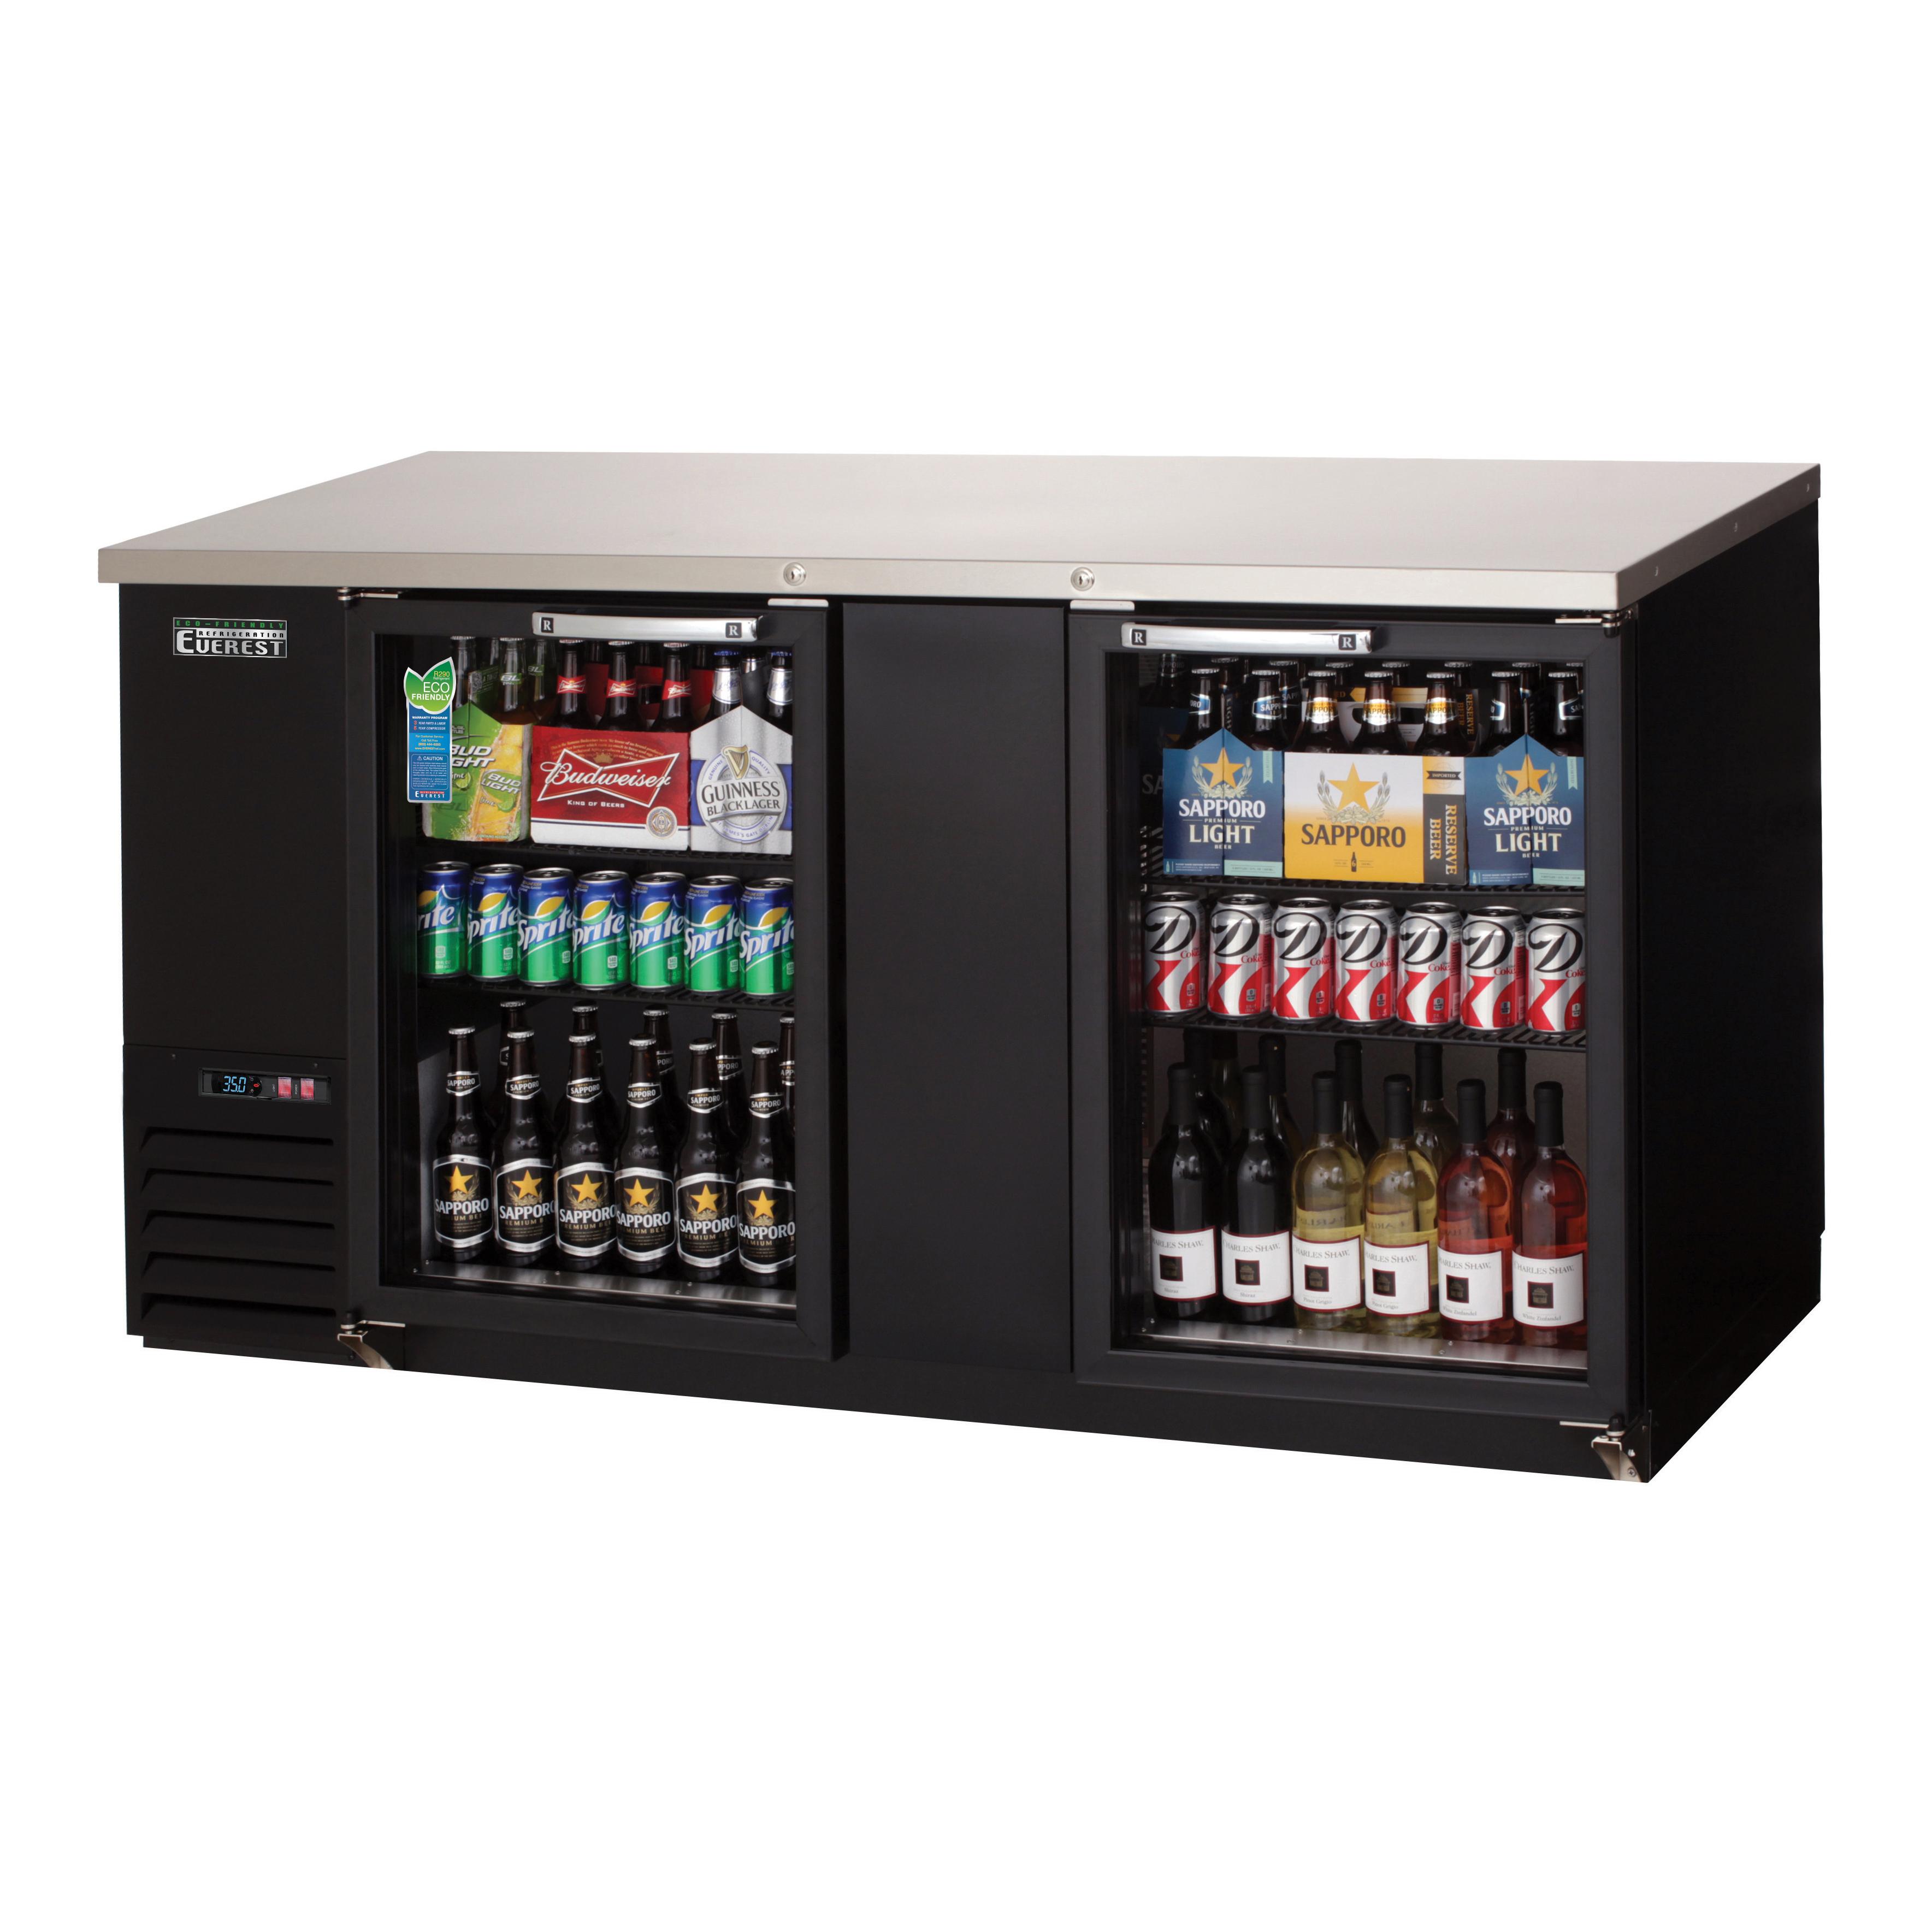 Everest Refrigeration EBB69G back bar cabinet, refrigerated